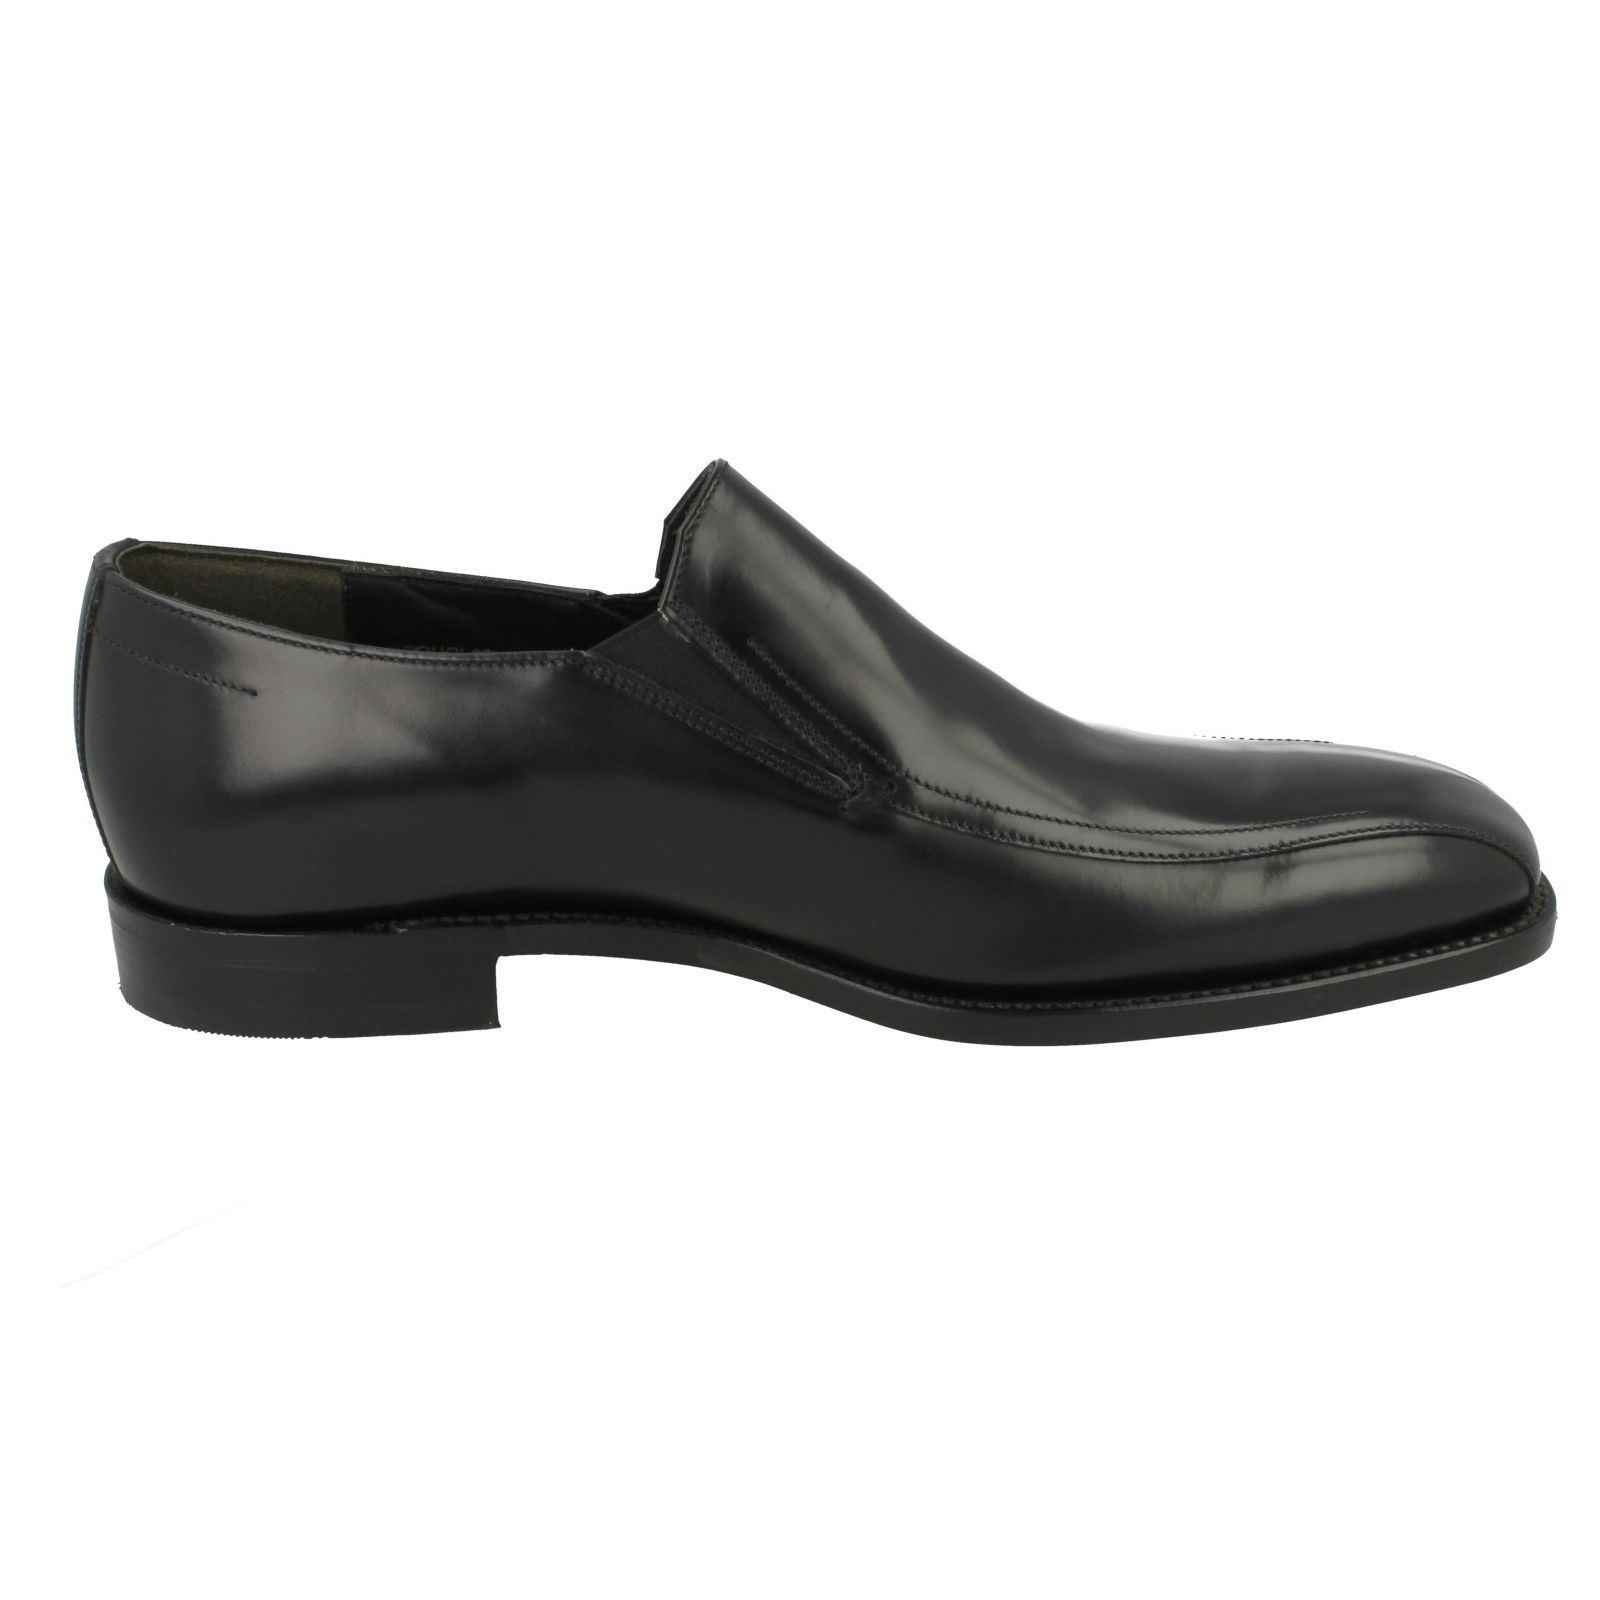 Herren Herren Herren Loake Formal Schuhes Fitting F Style - Douglas e33bce